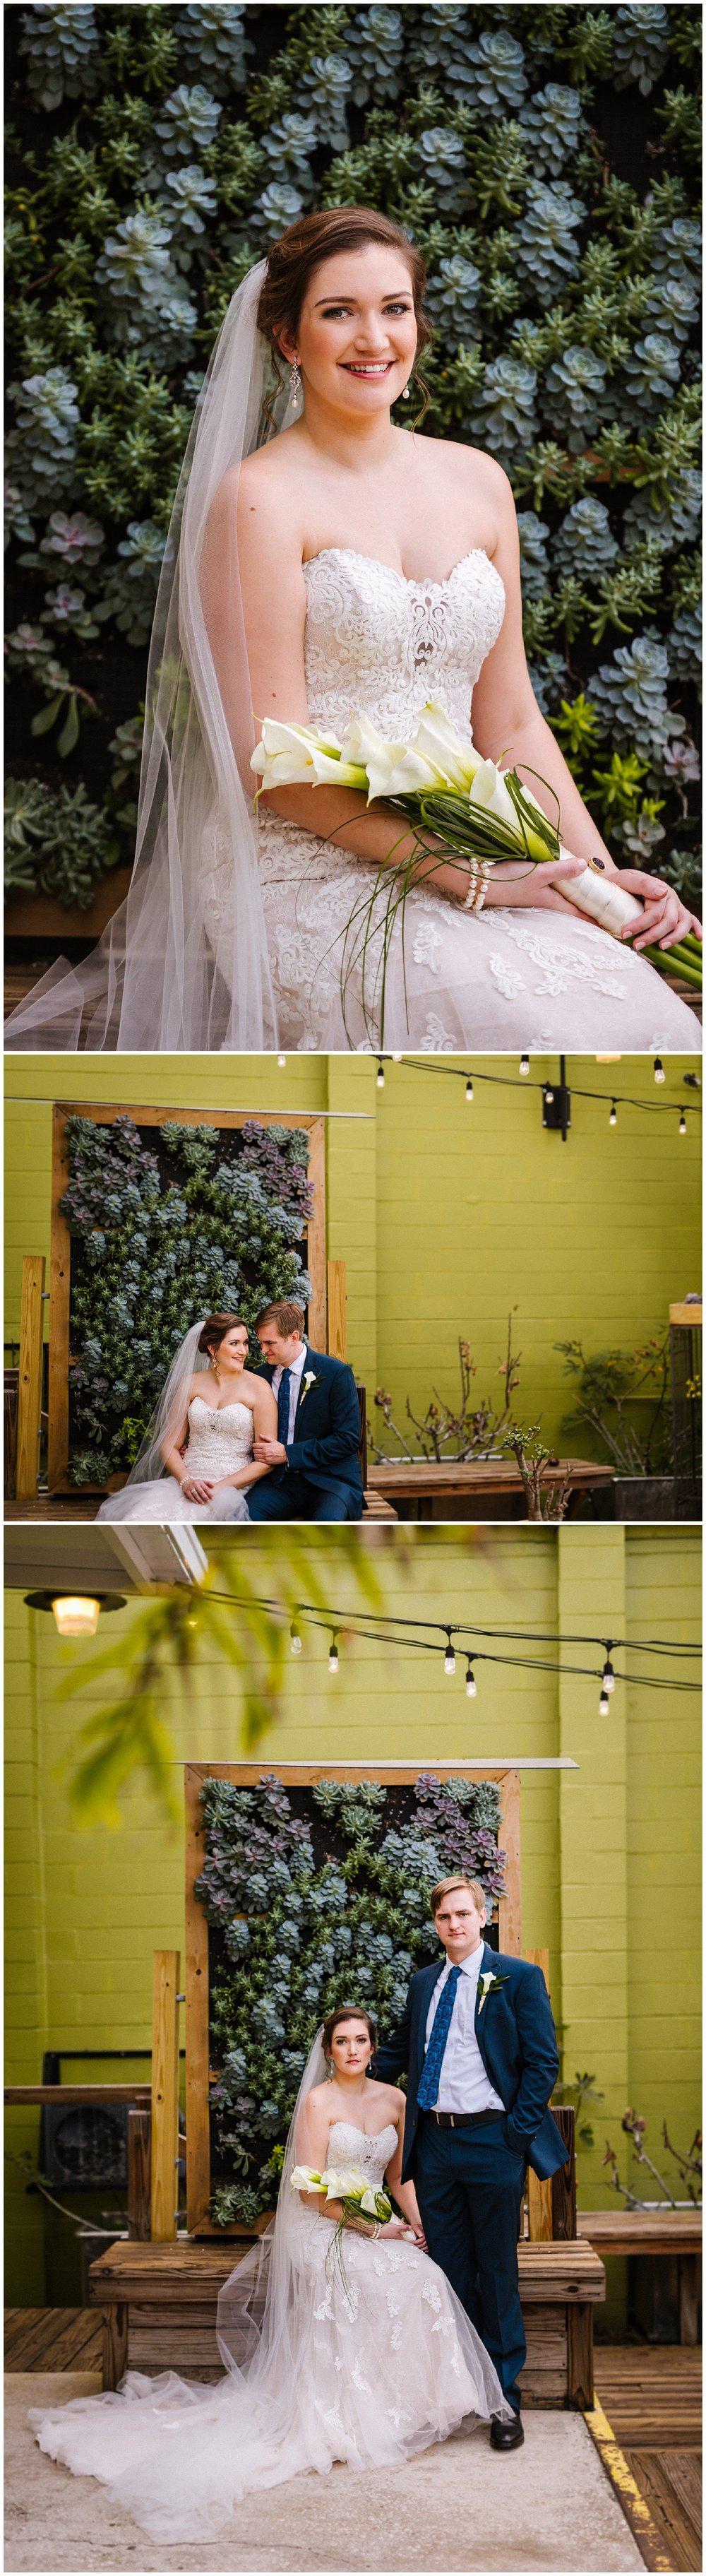 St-pete-wedding-photography-unique-glass-blowing-gallery-succulent-art_0022.jpg